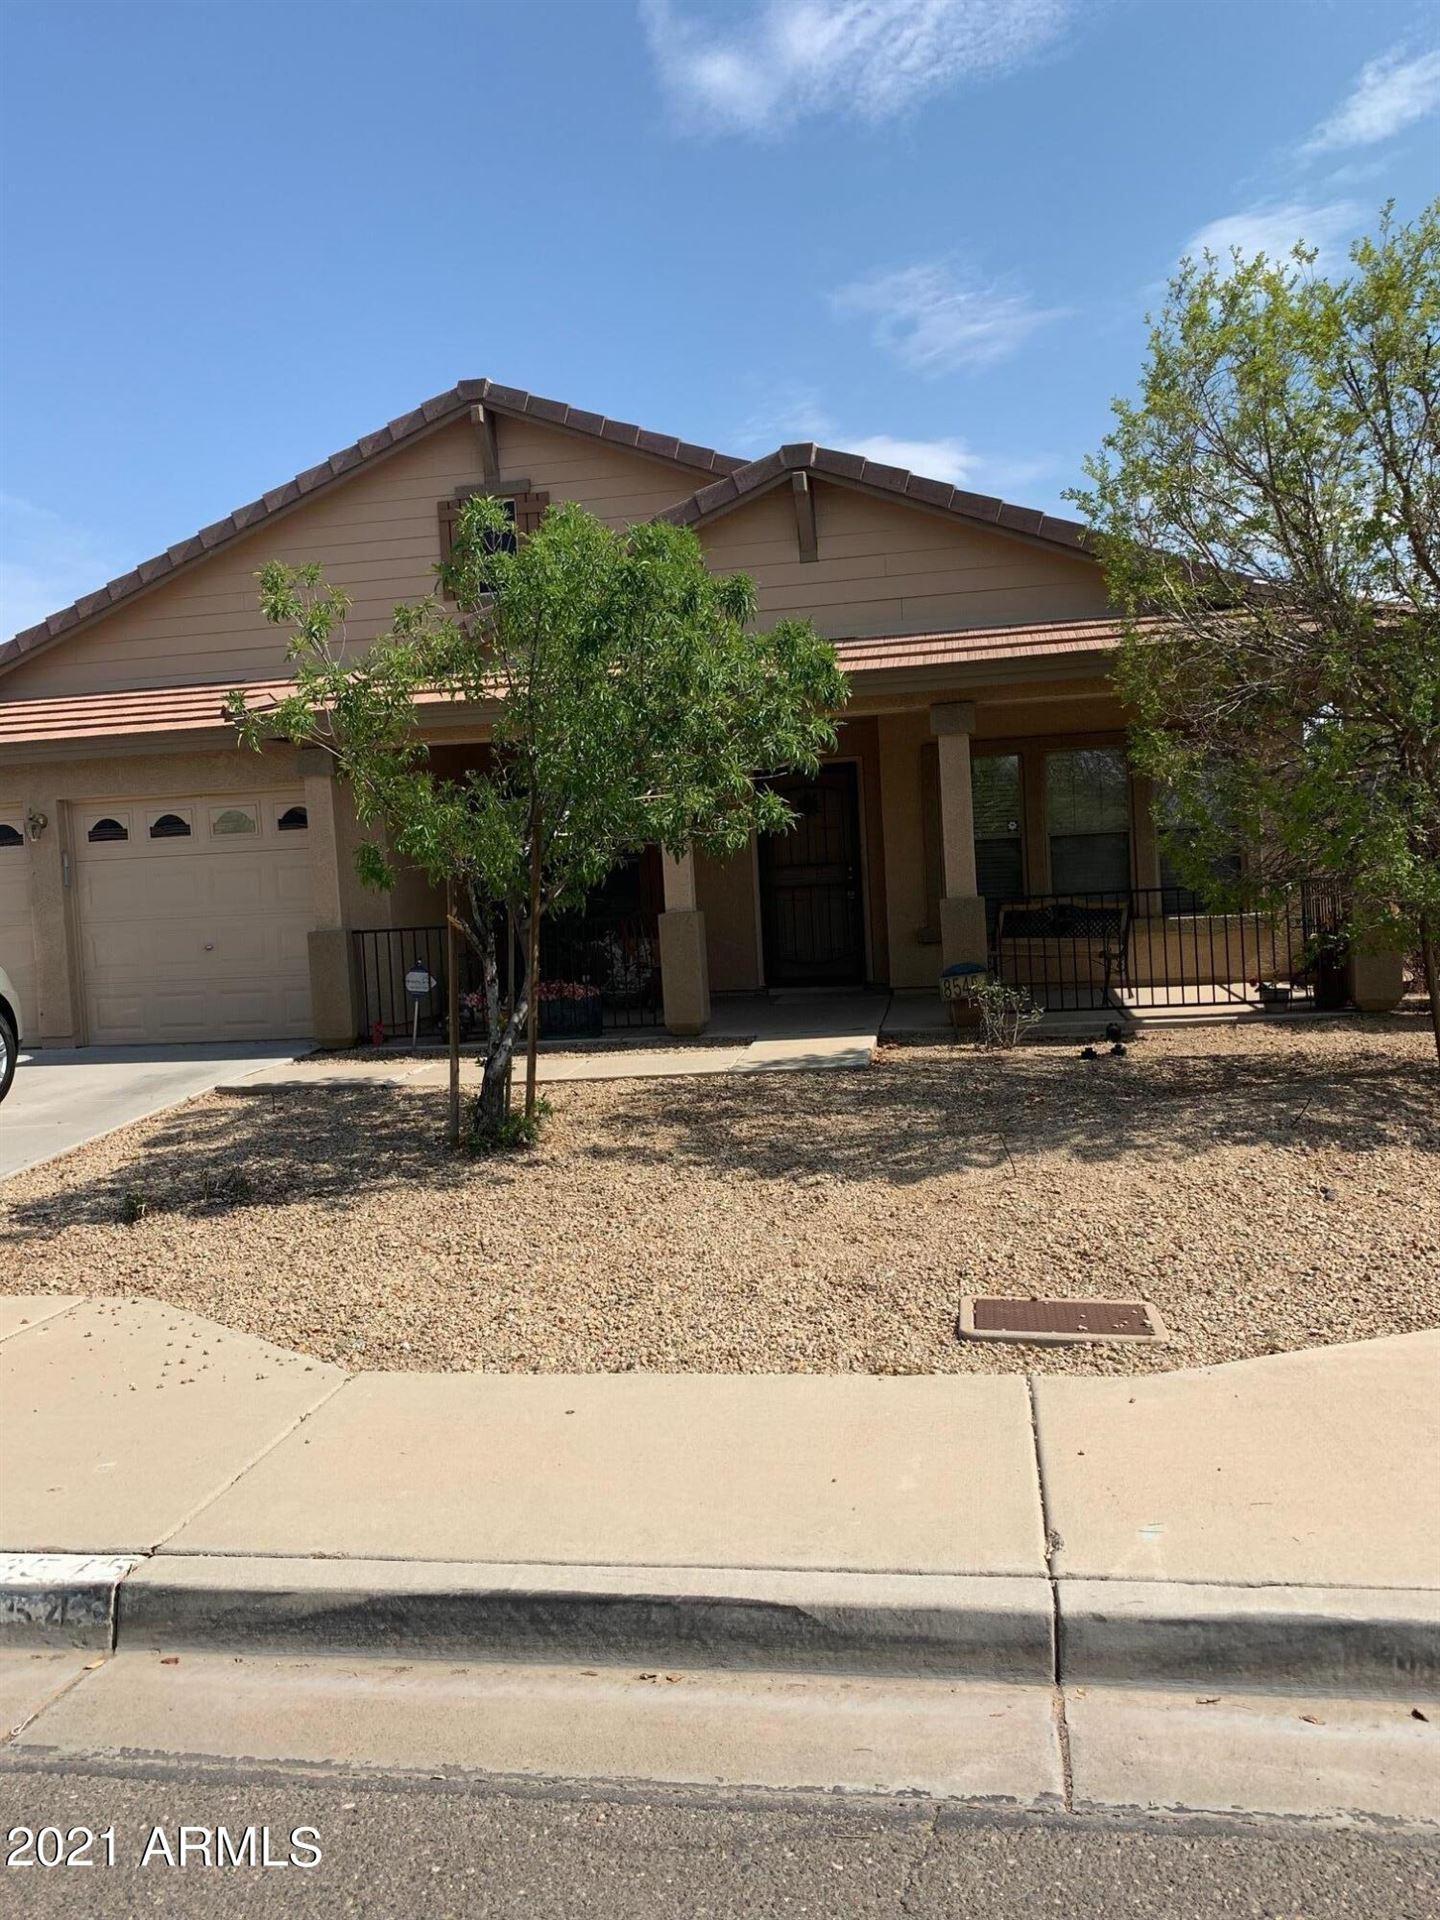 Photo of 8545 W HUGHES Drive, Tolleson, AZ 85353 (MLS # 6268042)